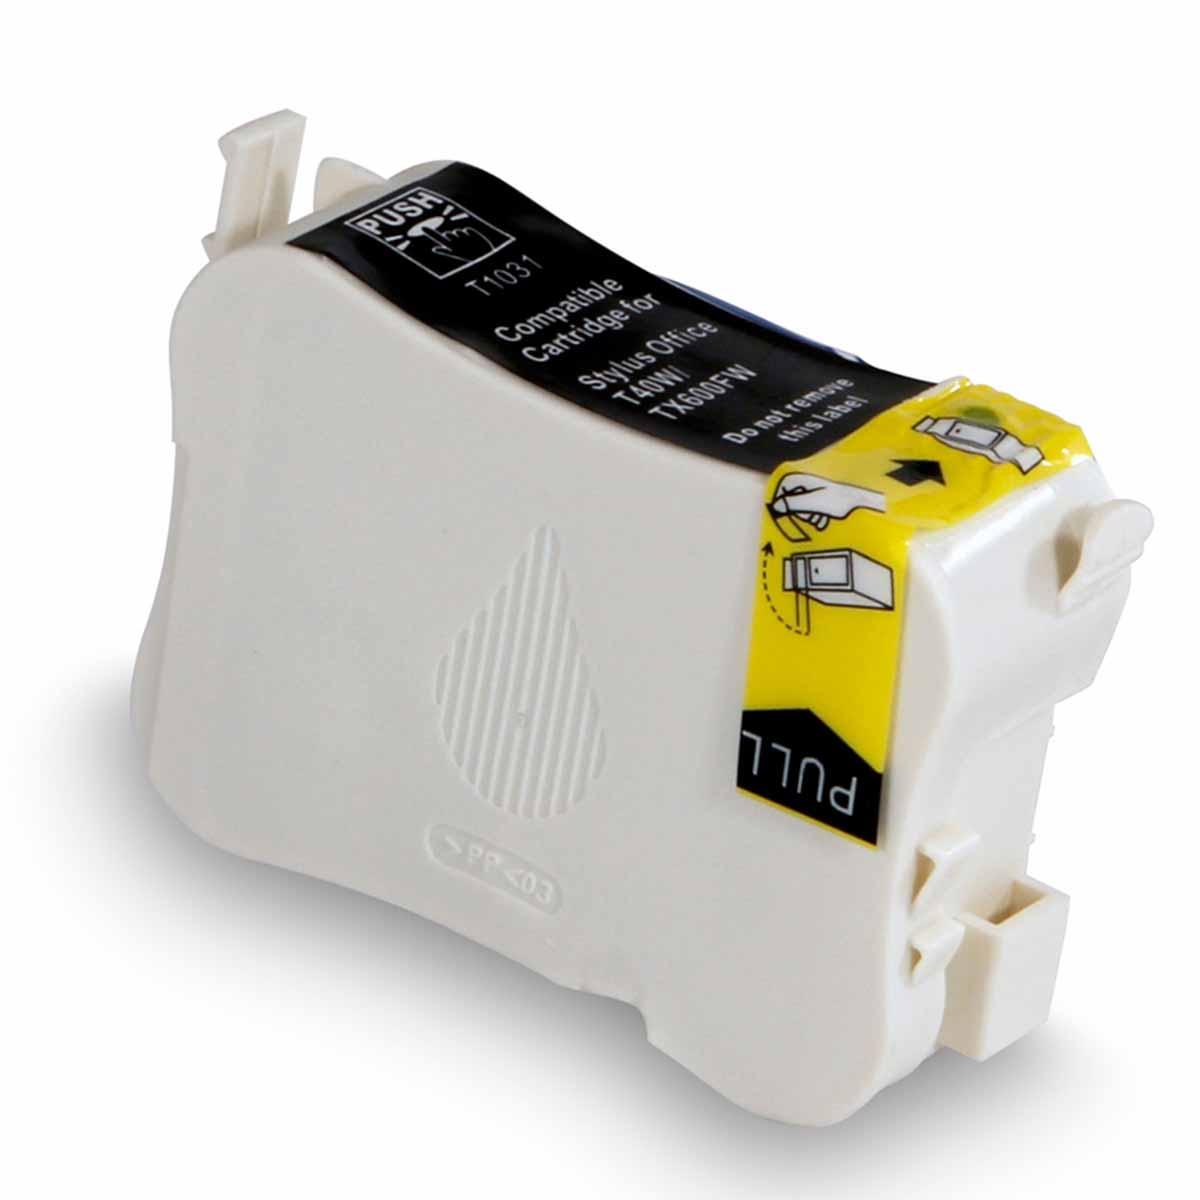 CARTUCHO EPSON T103120 T103 T1031 - T40W/TX550FW/TX600FW BLACK (COMPATÍVEL)